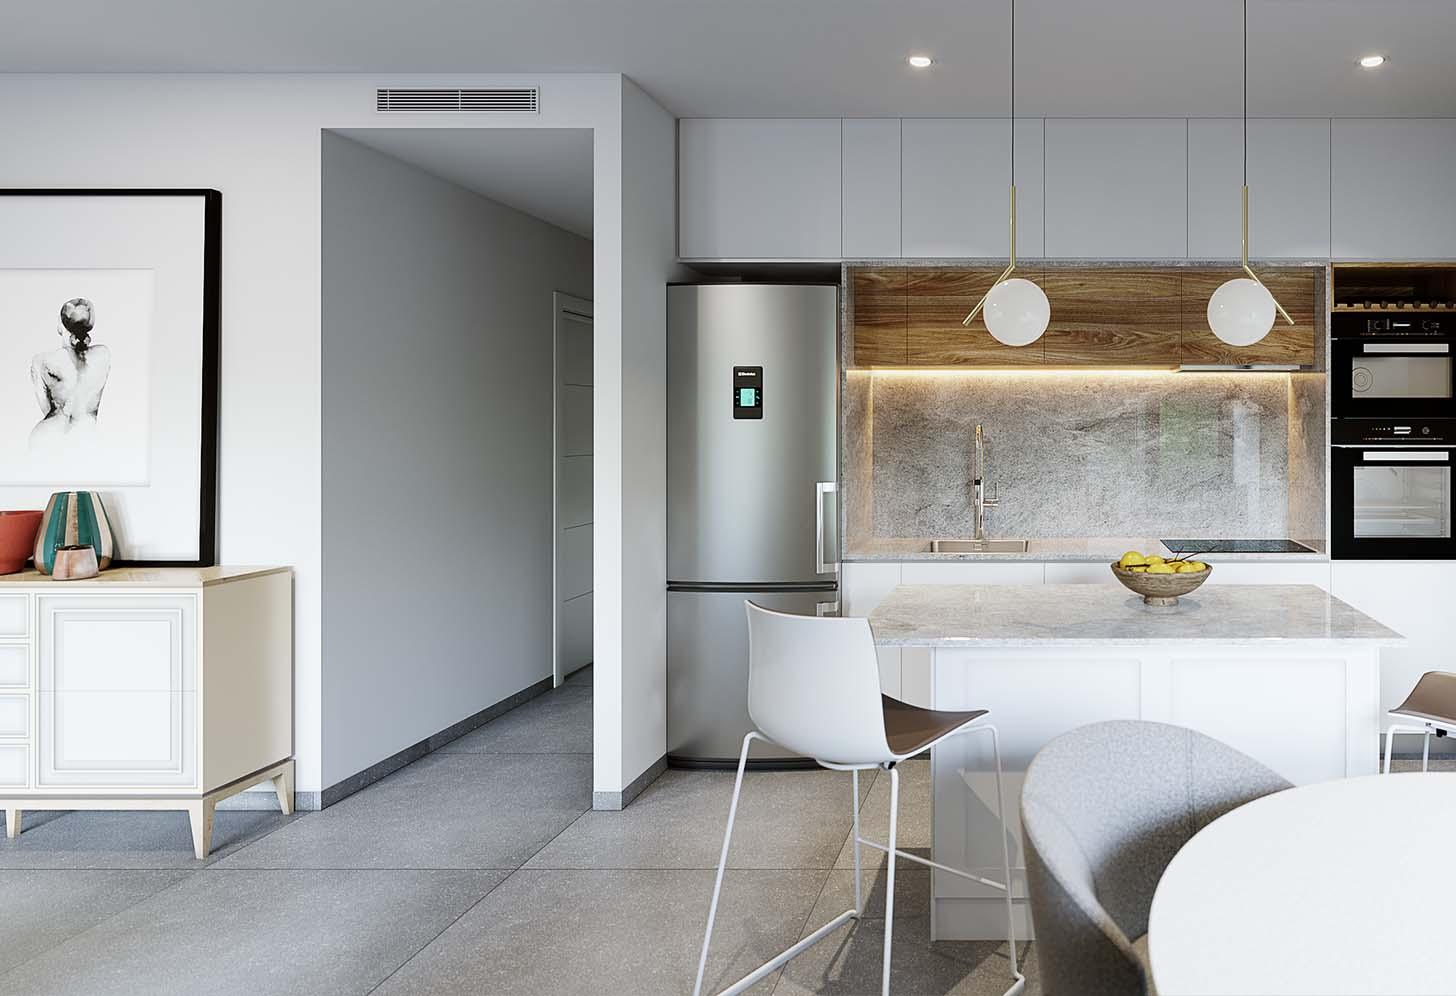 immobilier neuf espagne costa blanca on-d15 palmeral roda golf cuisine